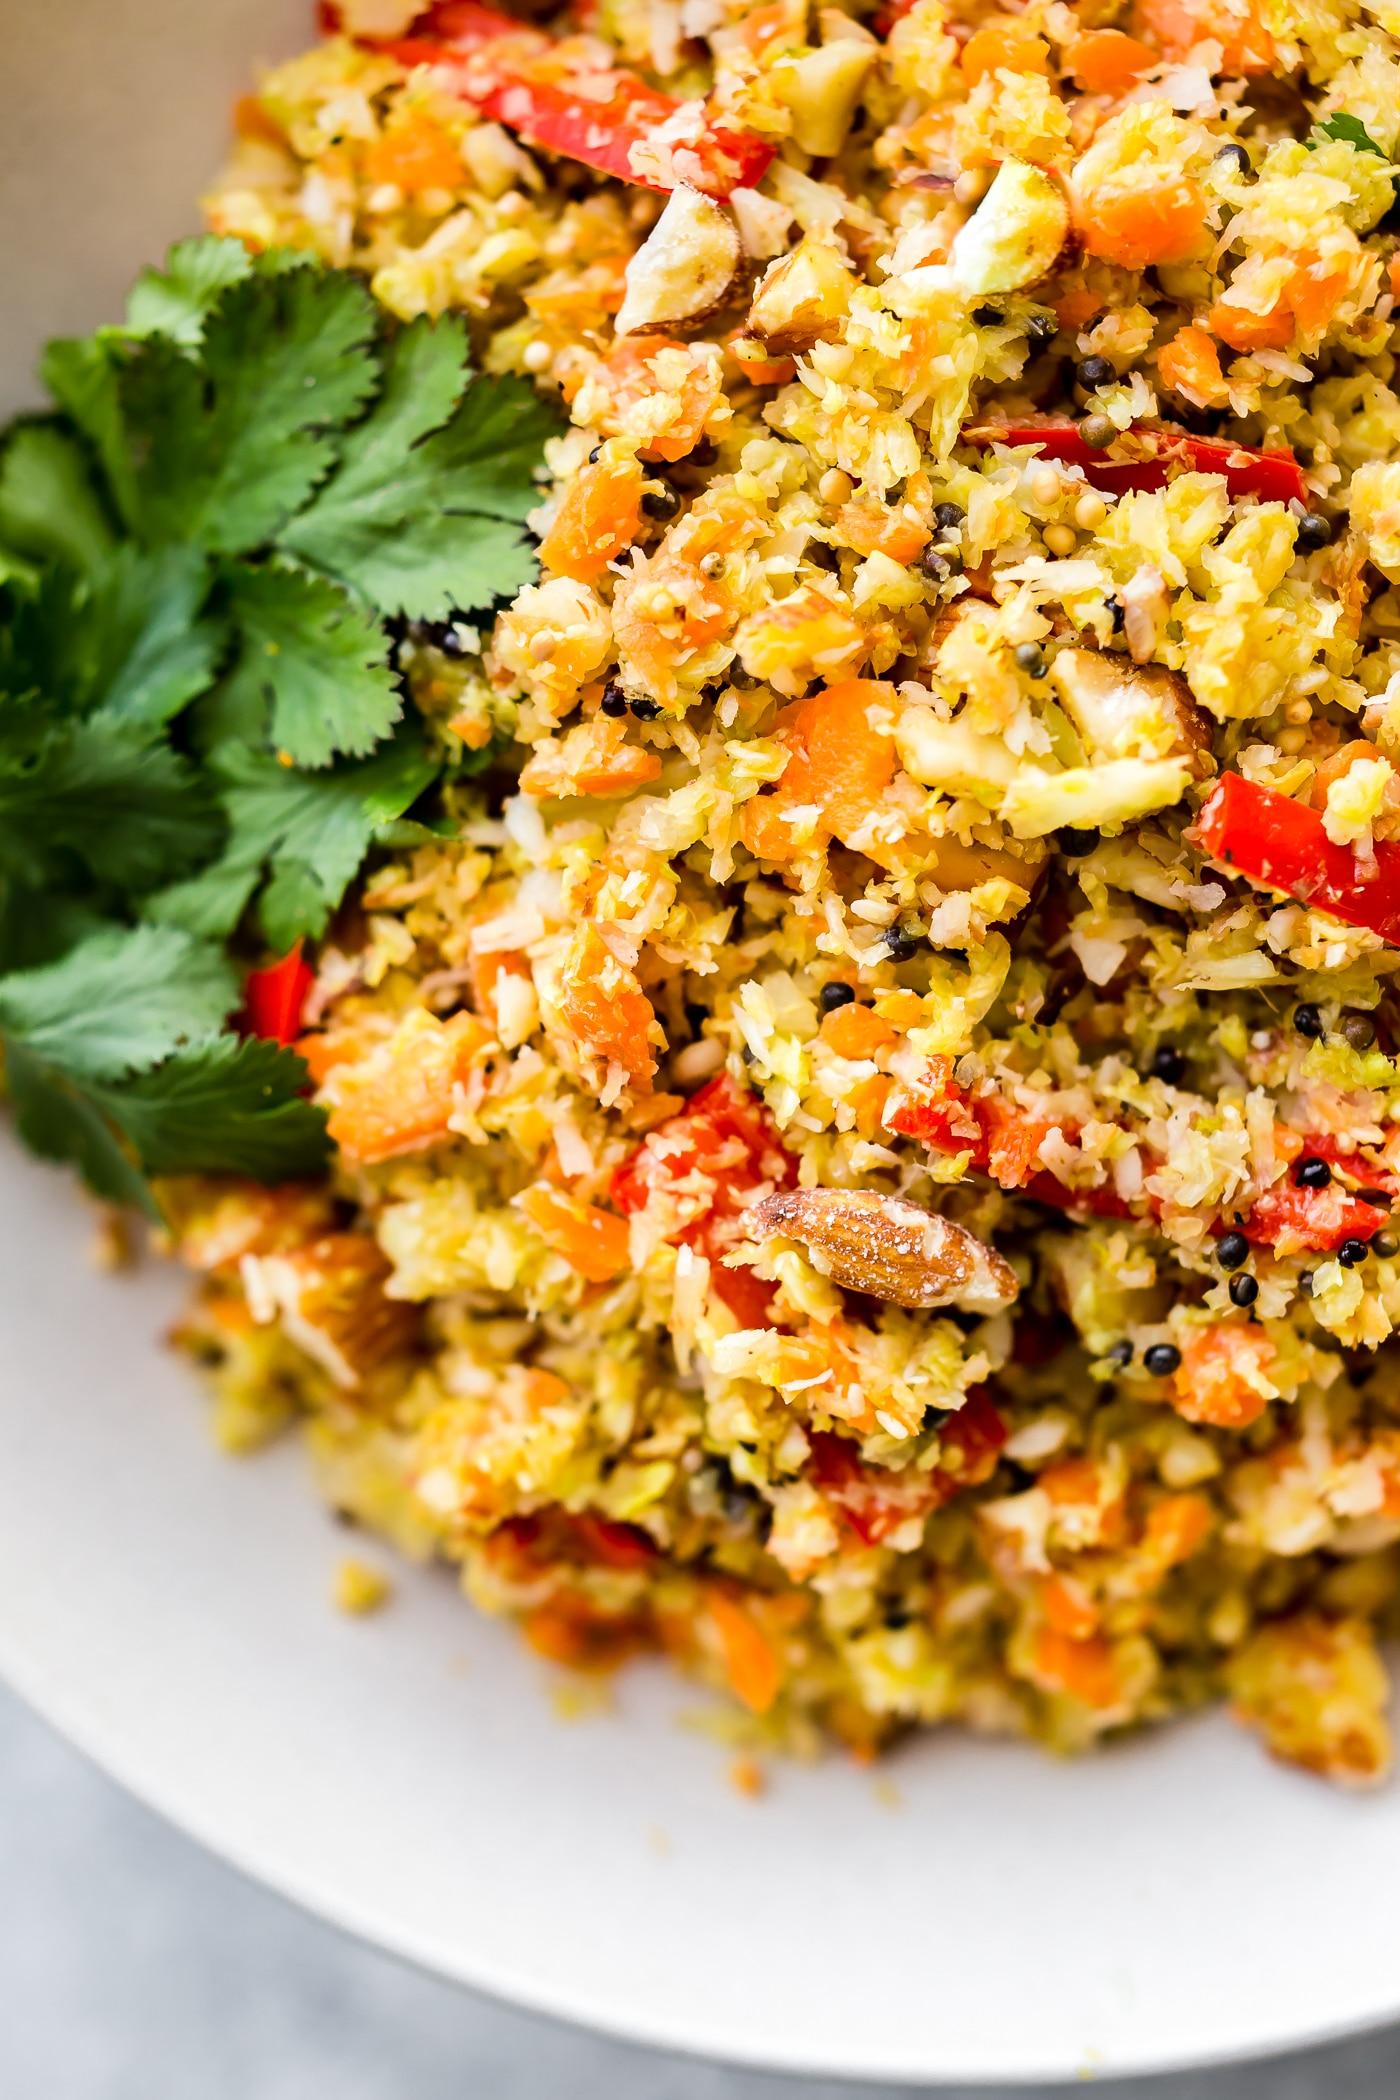 Gujarati Style Coconut Almond Warm Cabbage Salad {Vegan ...